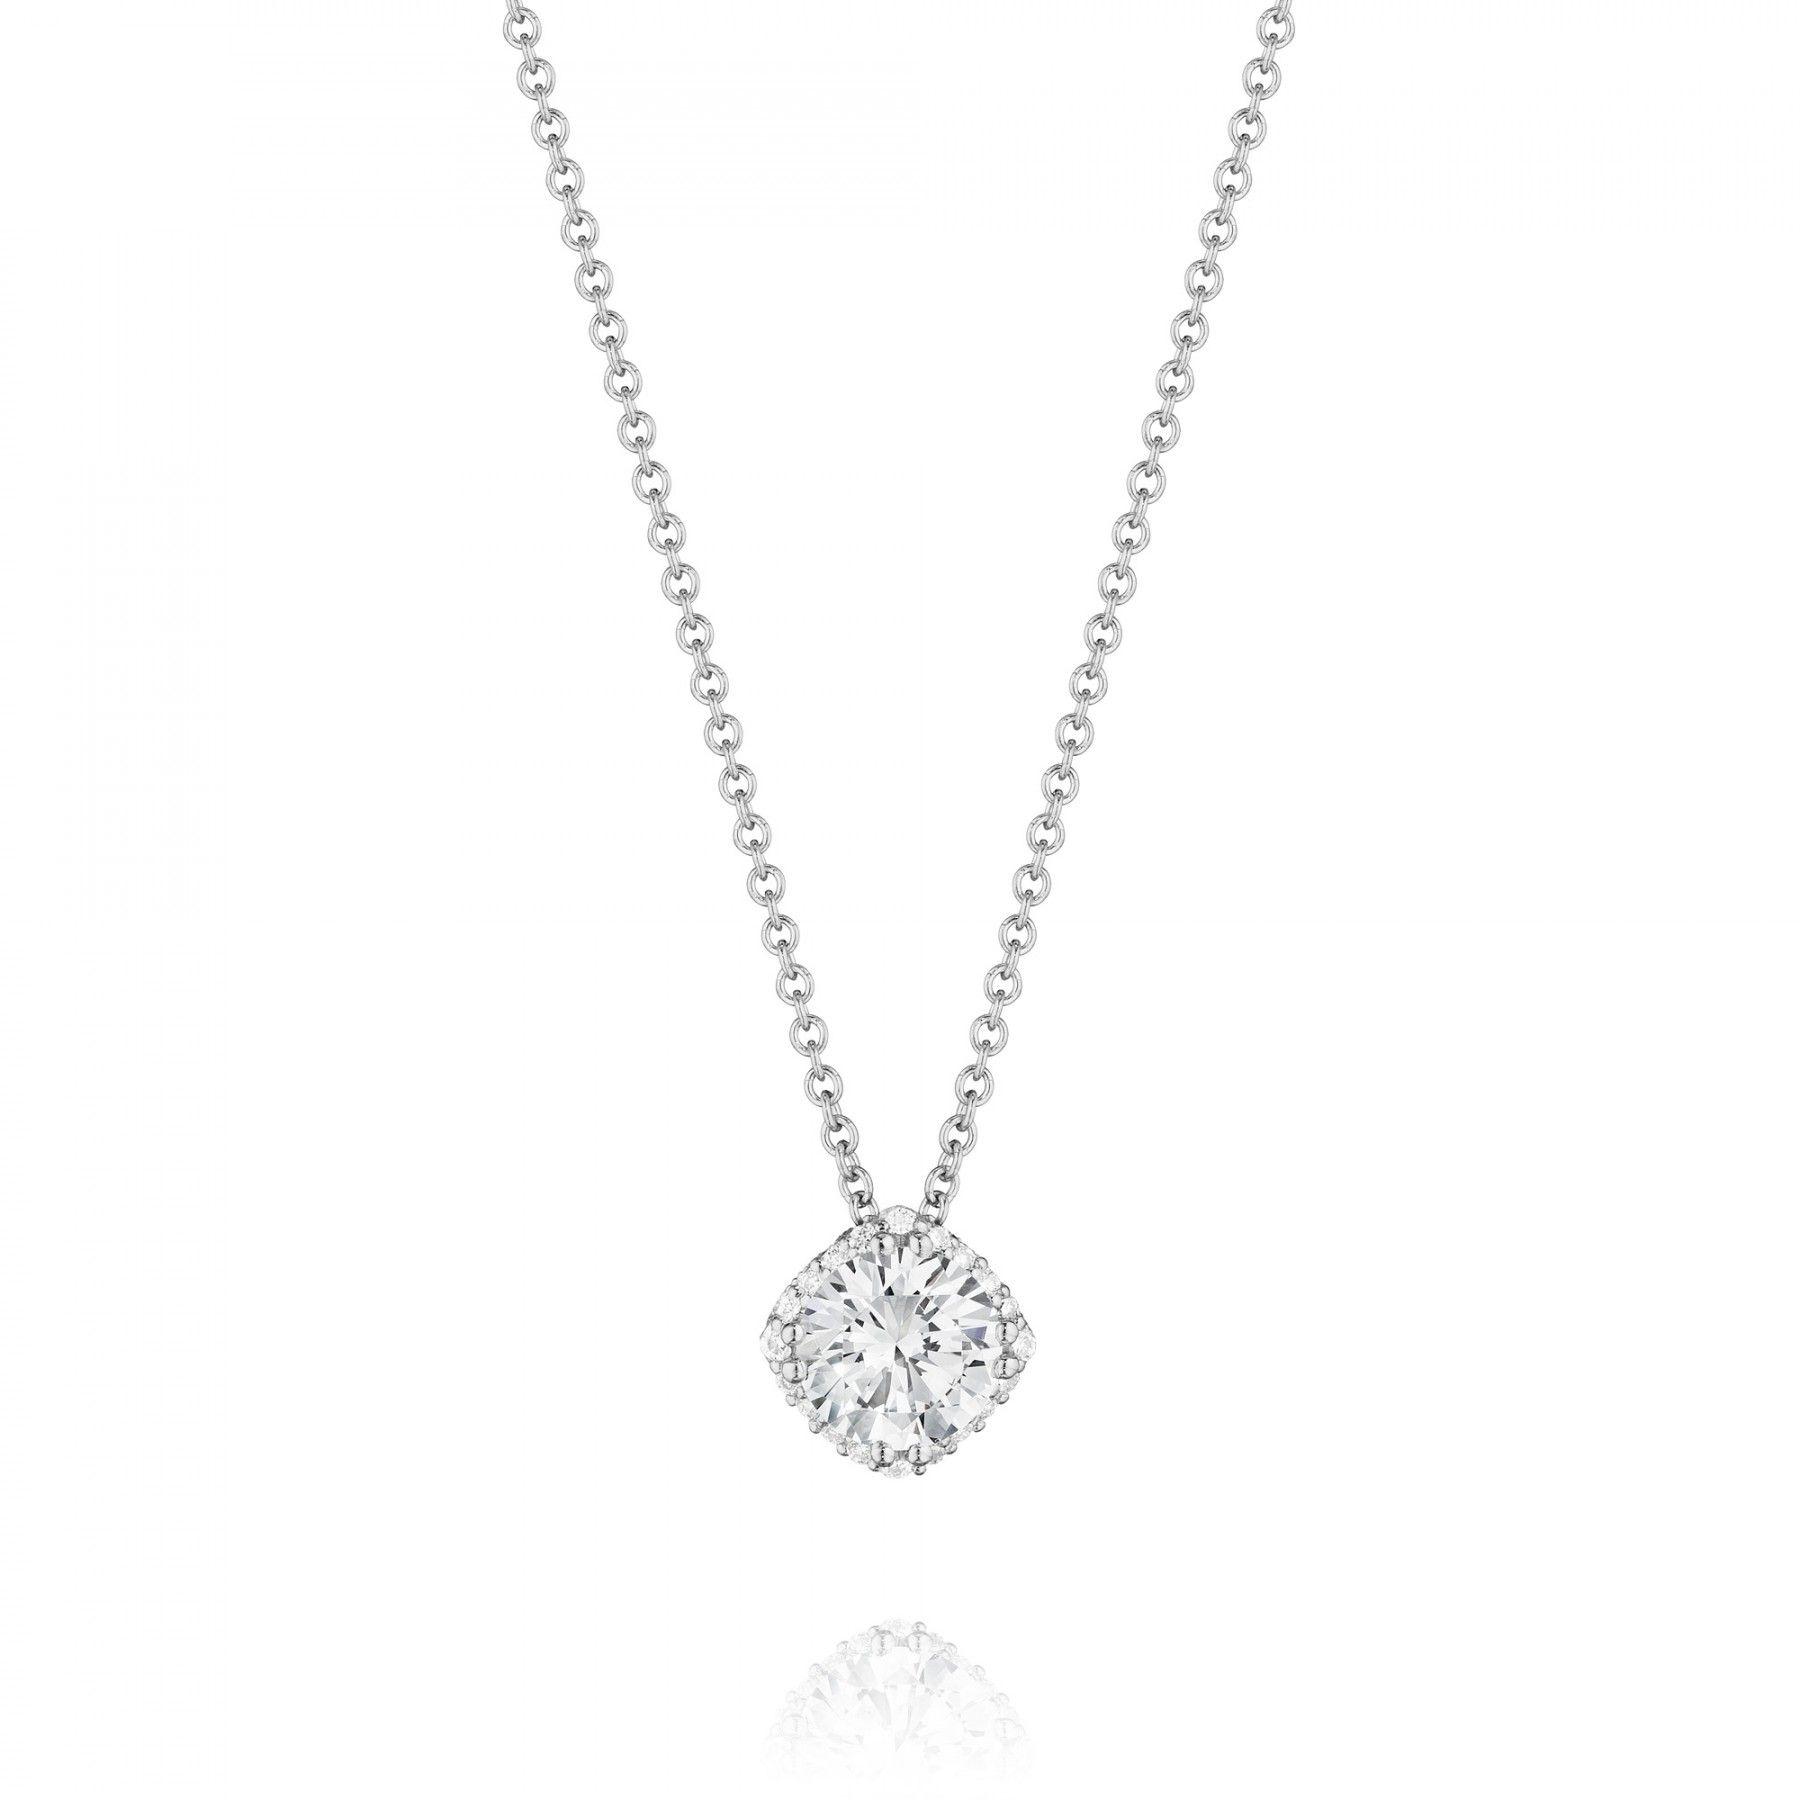 Style FP Dantela Diamond Necklace Jewelry Tacori